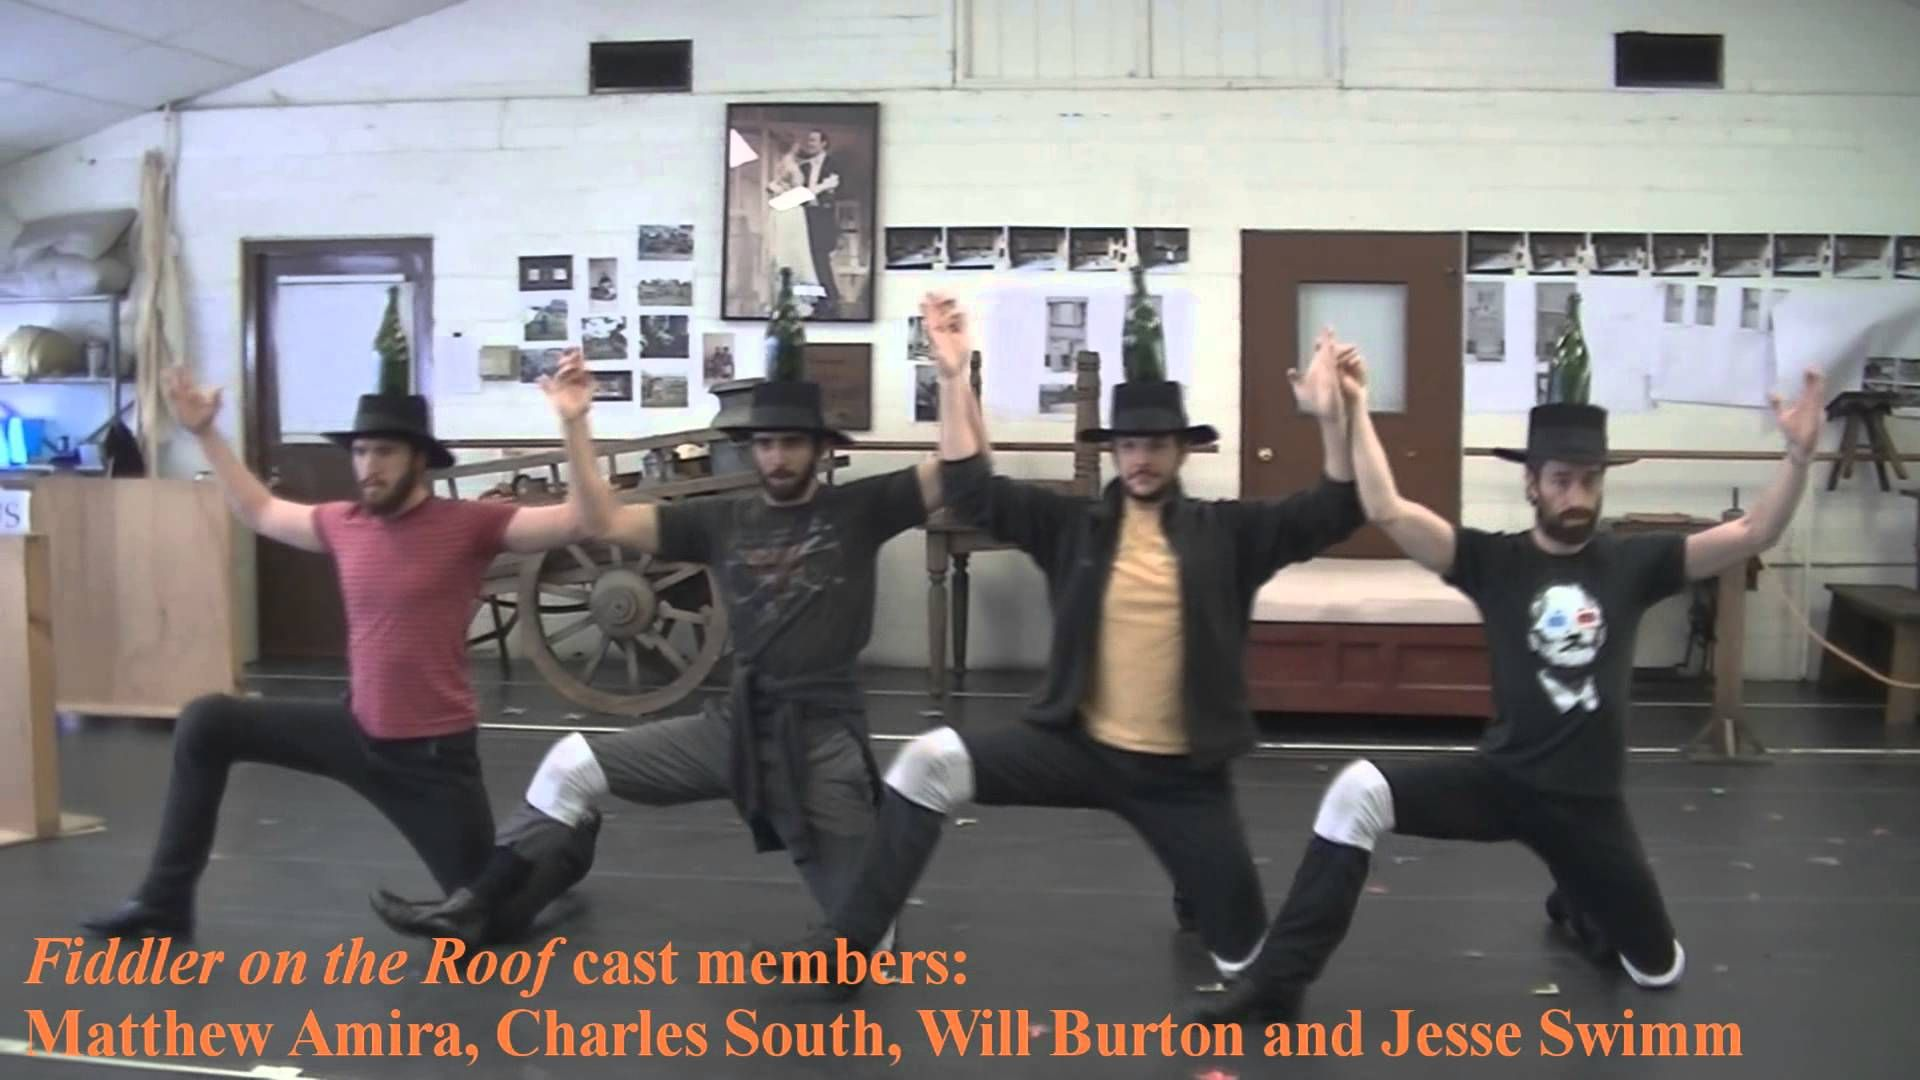 Talent, not tricks makes this bit if theatre magic work